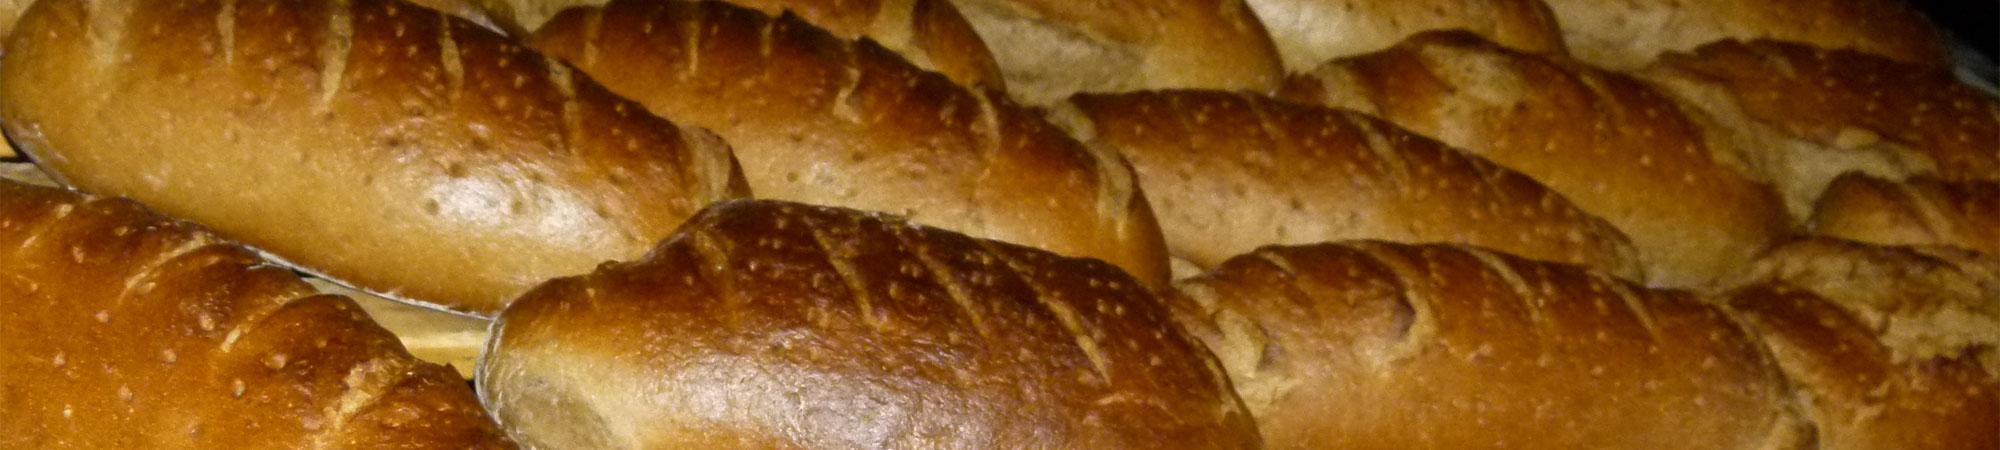 Bäckerei PfeifferBeck Süße Bioware